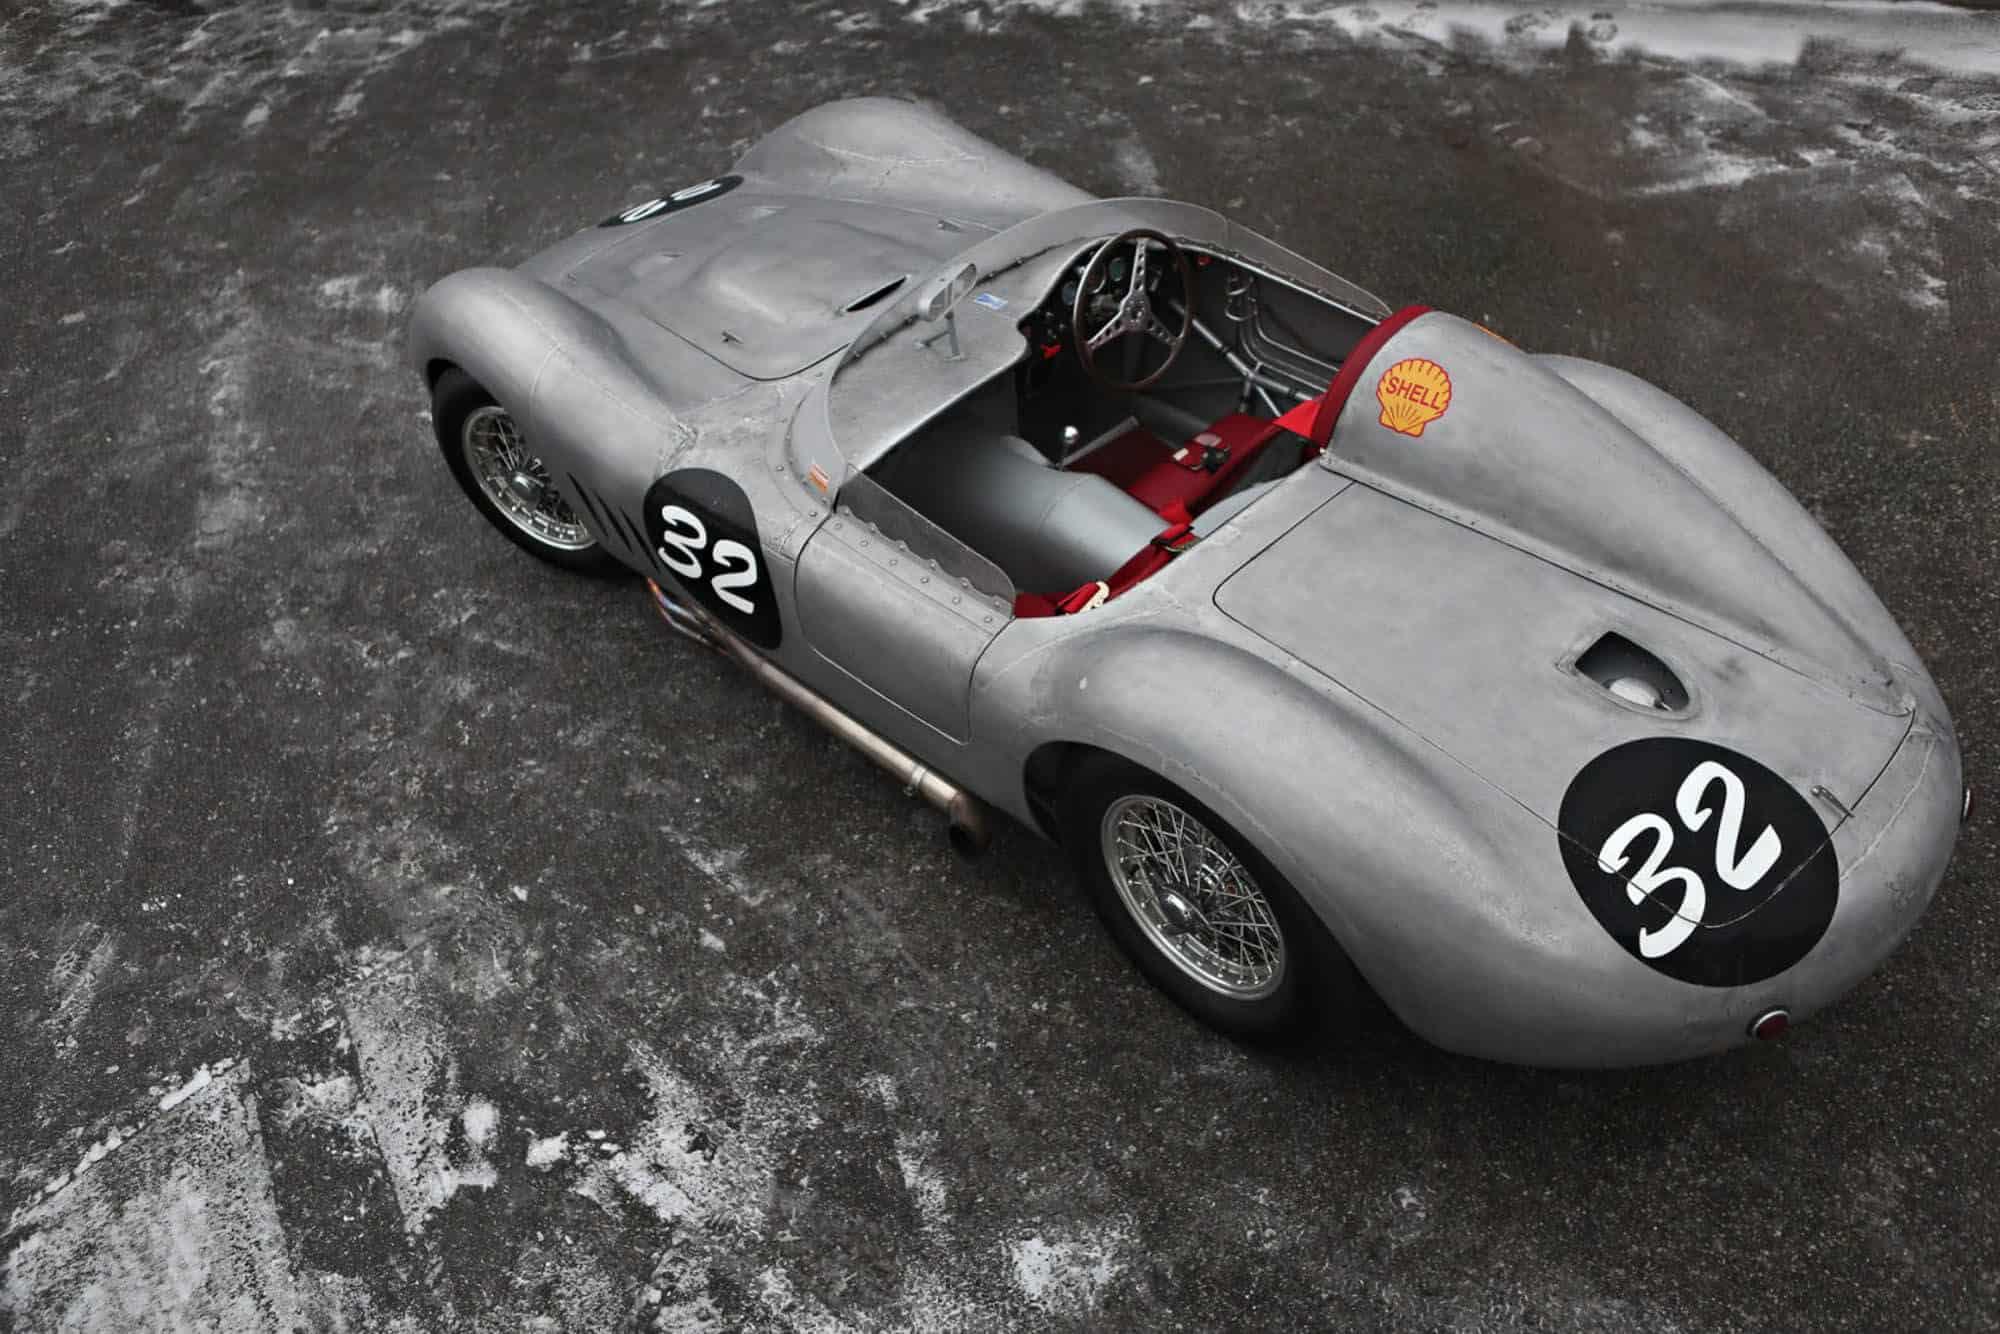 1956-Maserati-200-SI-race-car.jpg